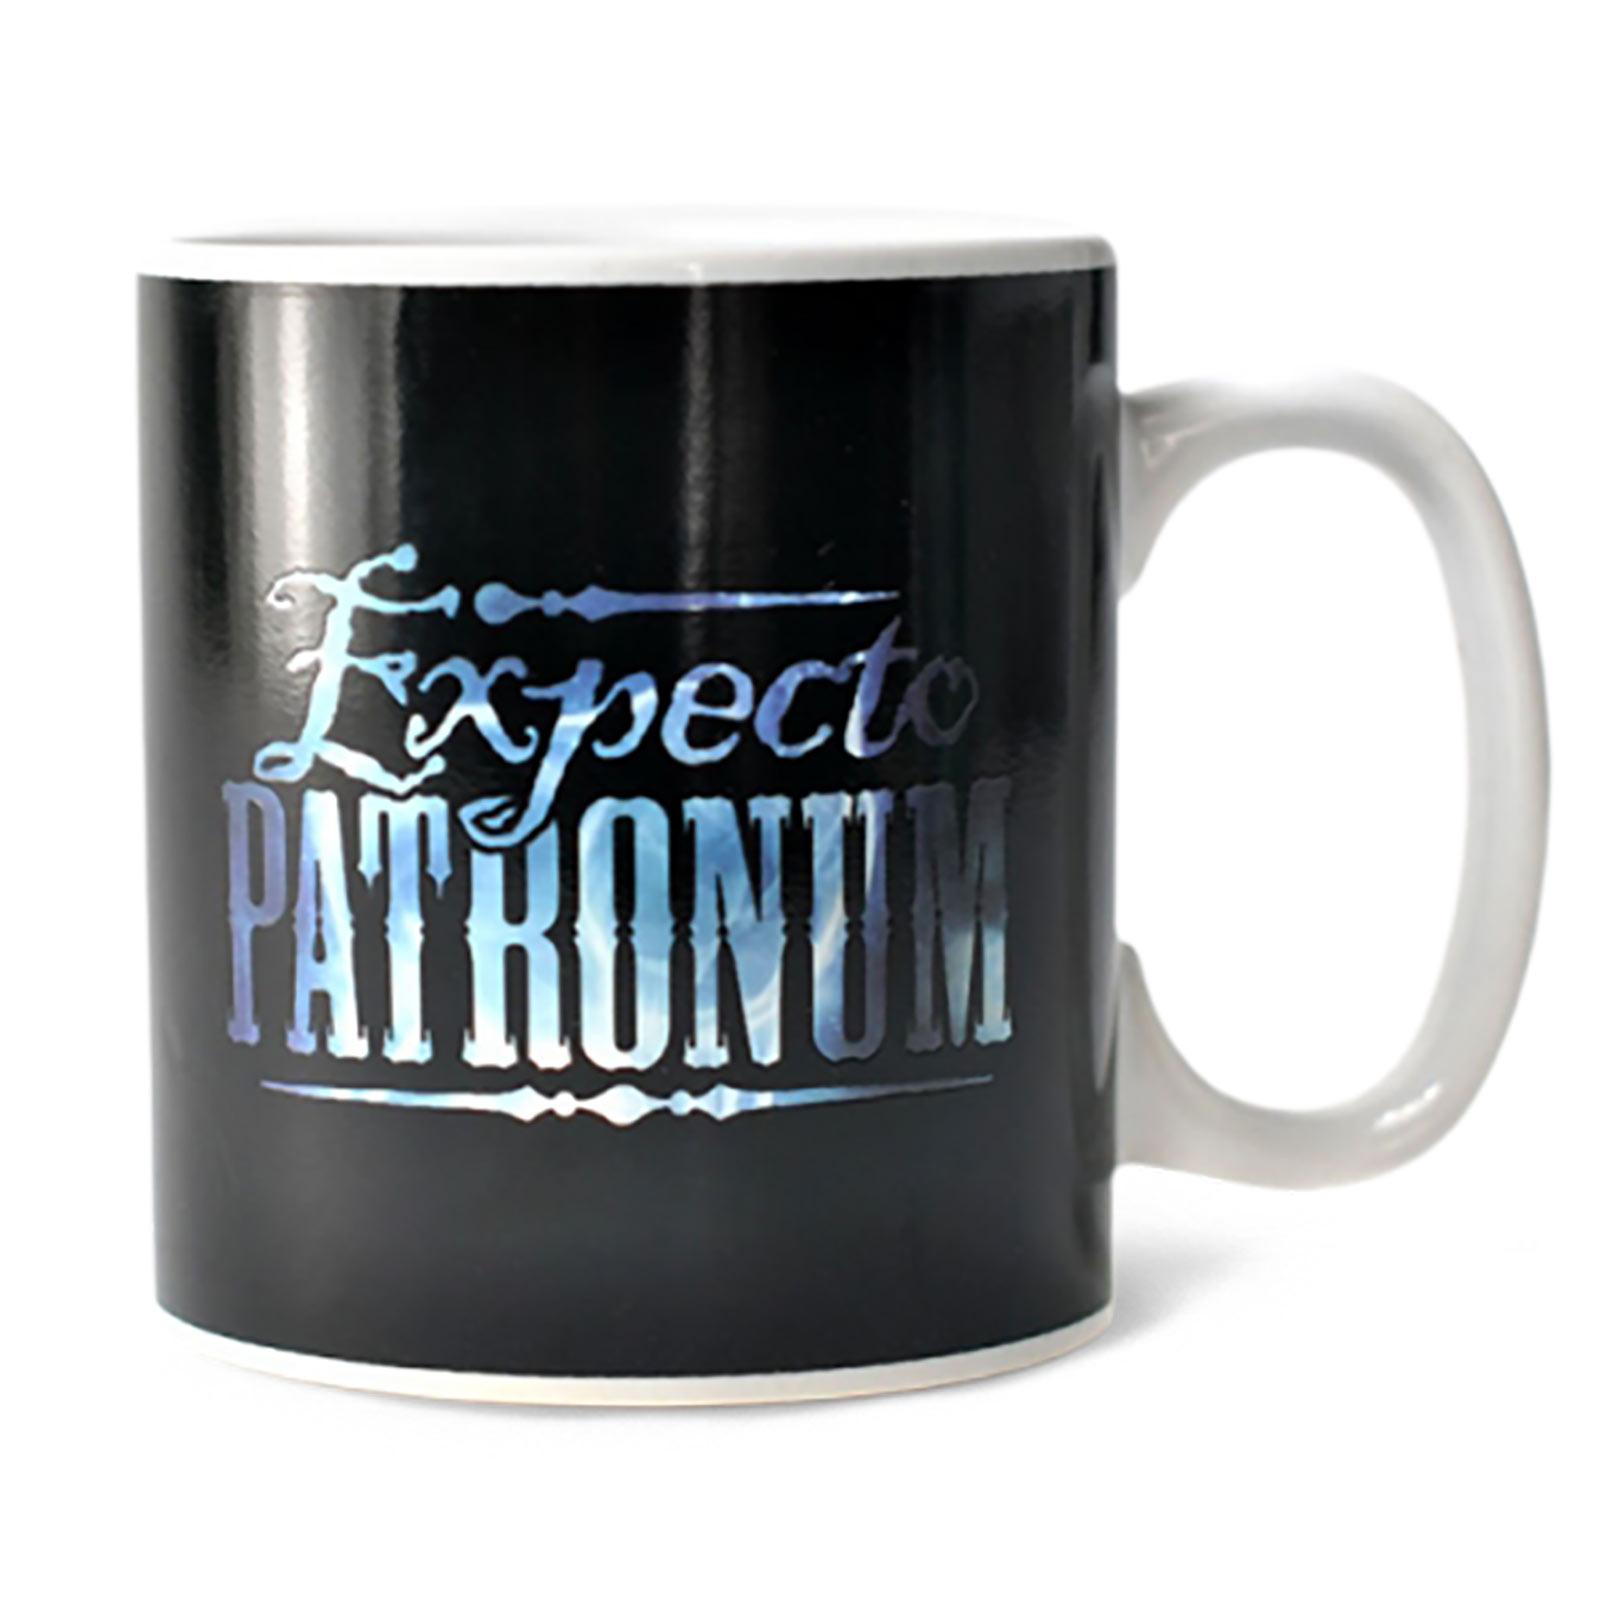 Harry Potter - Patronus Thermoeffekt Tasse